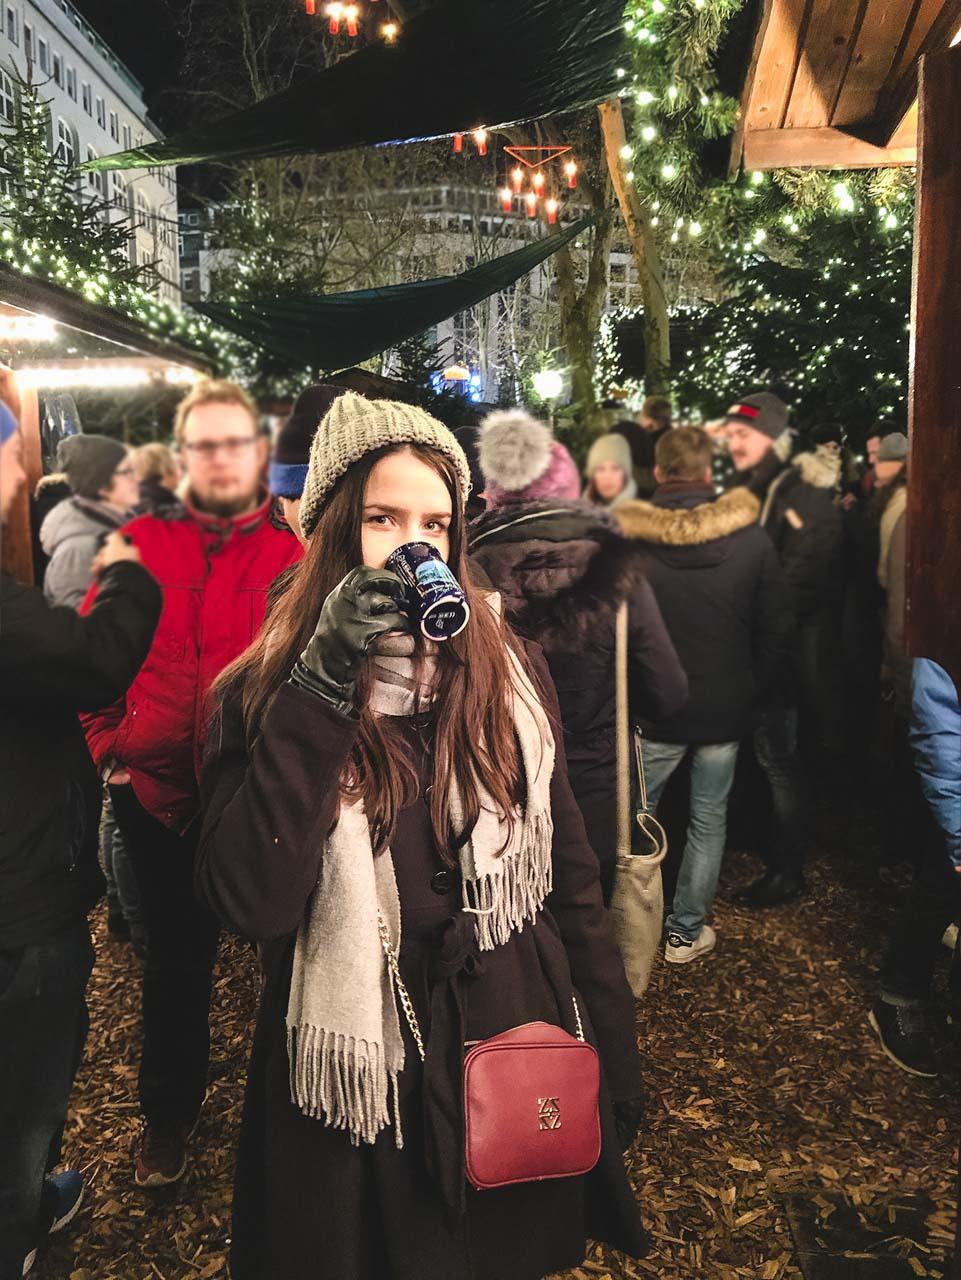 A girl holding a mug of mulled wine